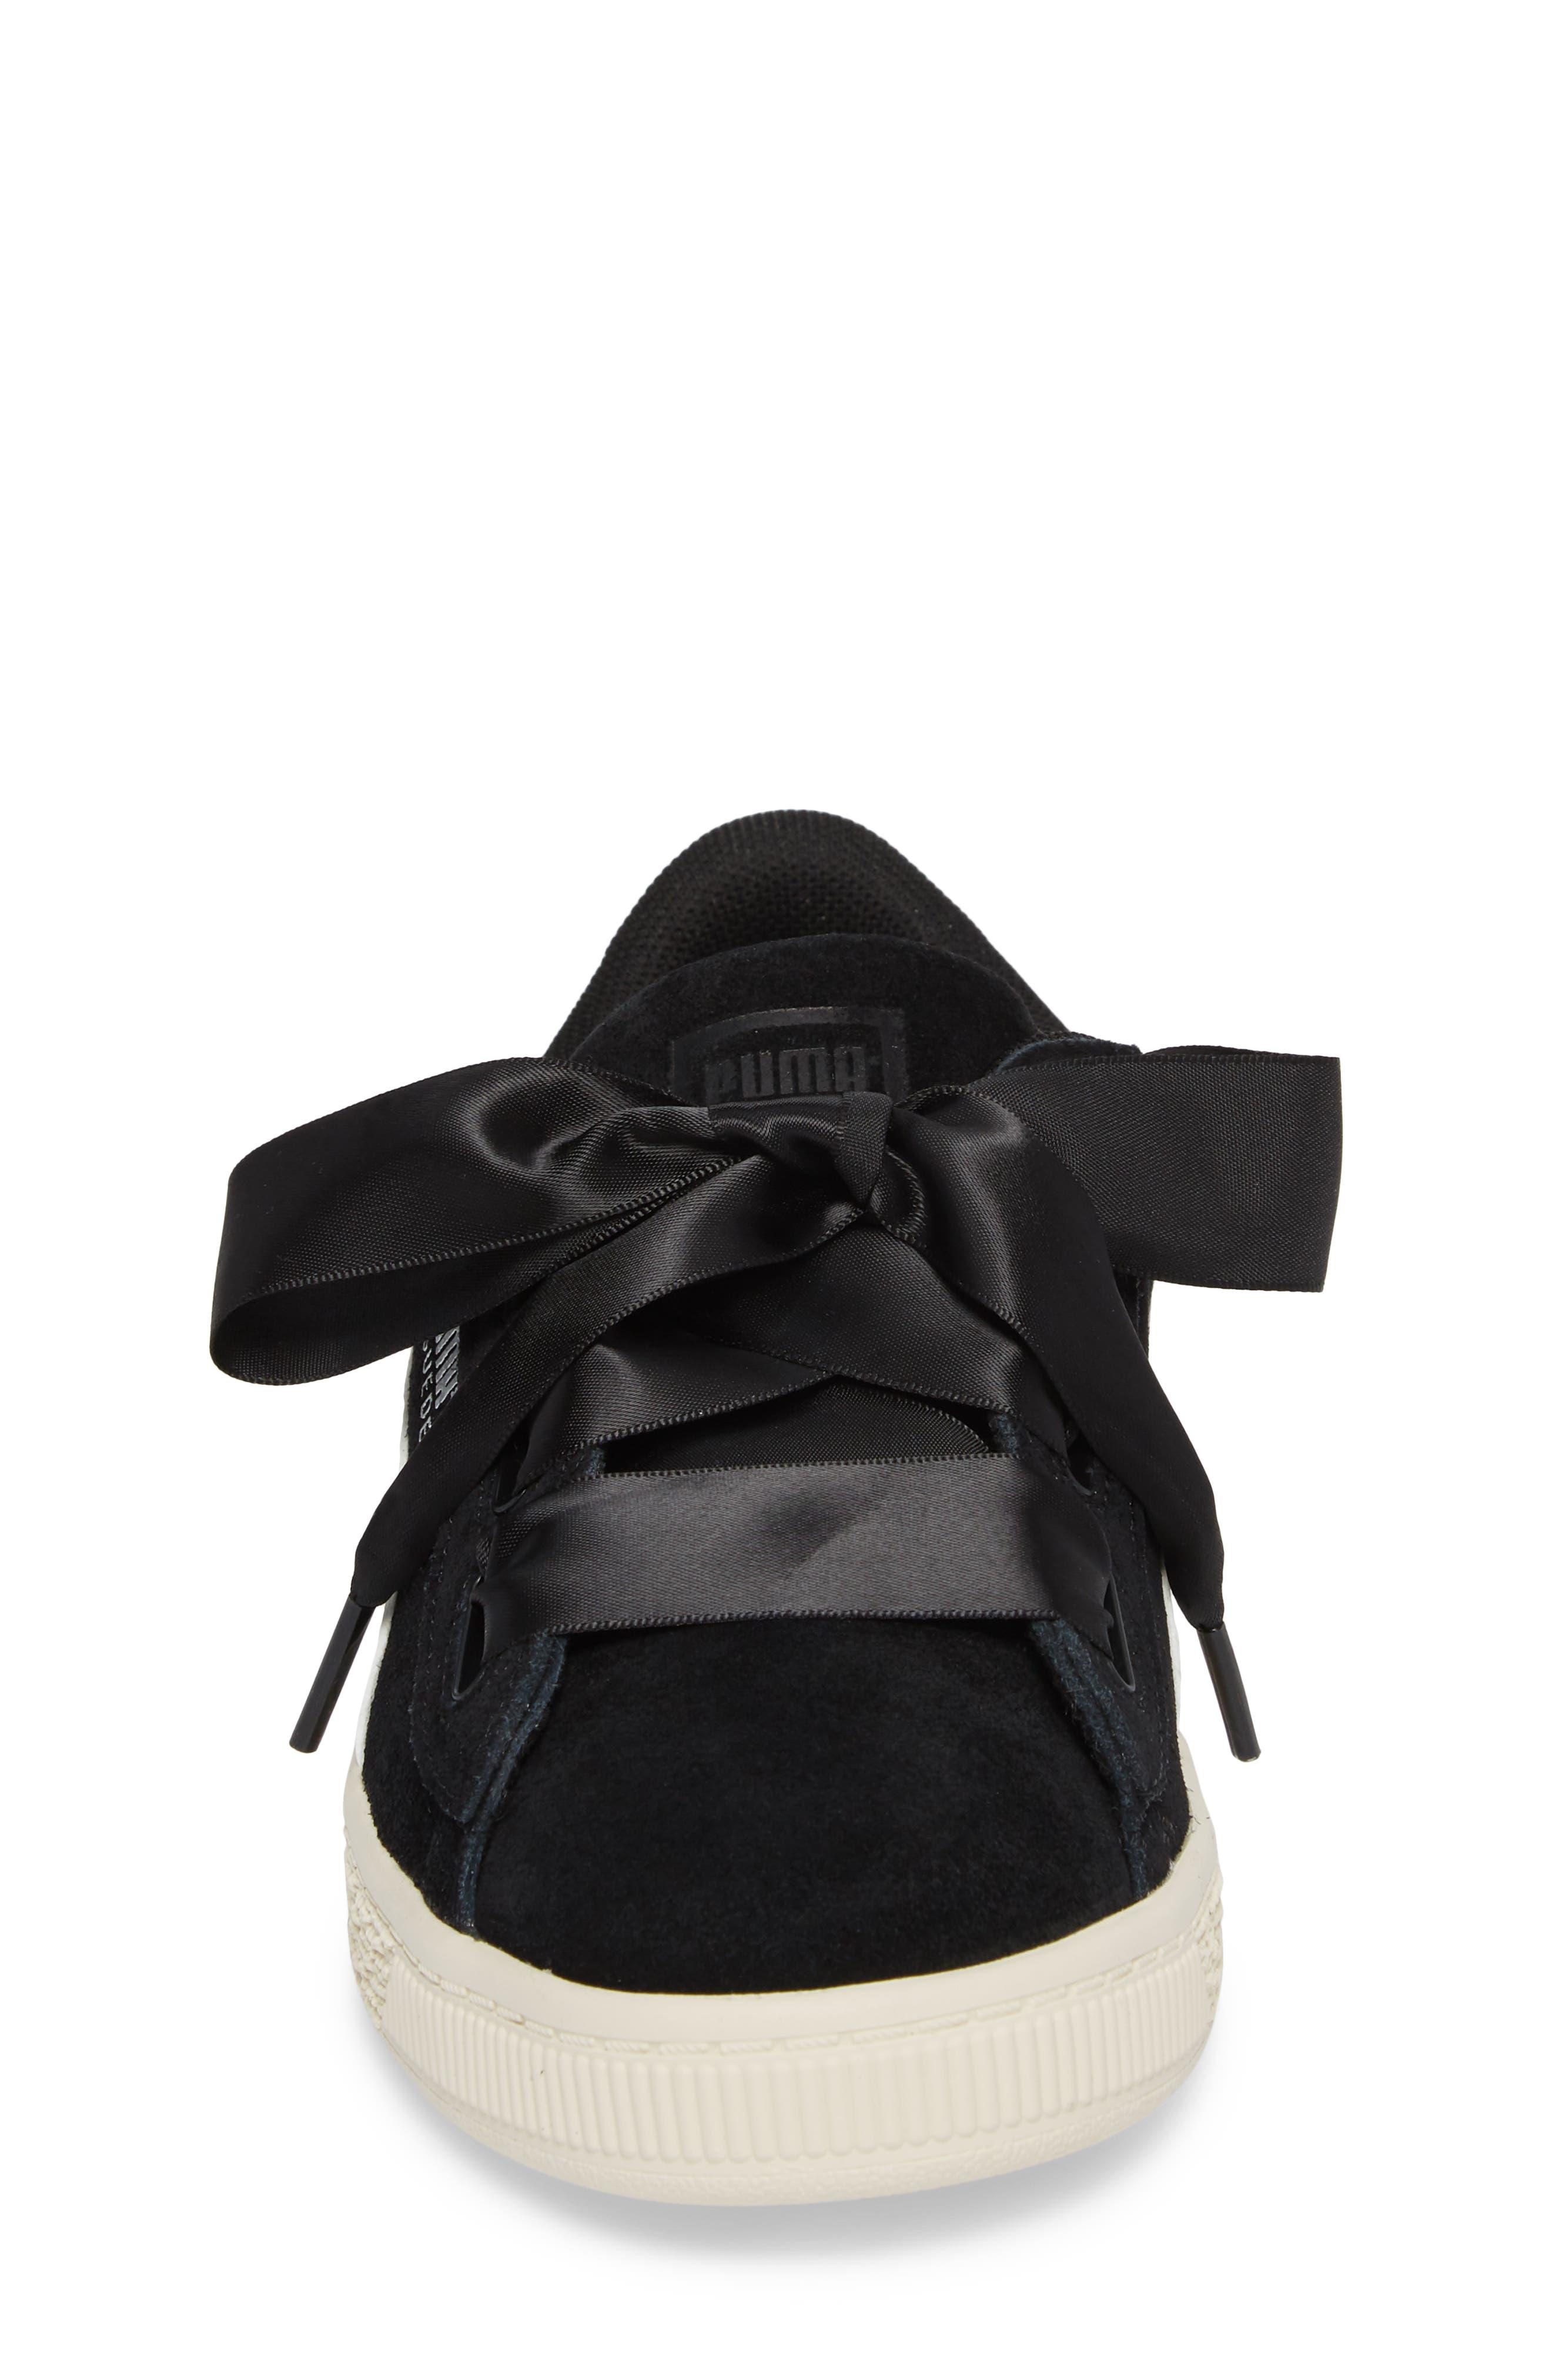 Suede Heart Sneaker,                             Alternate thumbnail 4, color,                             Puma Black/ Whisper White